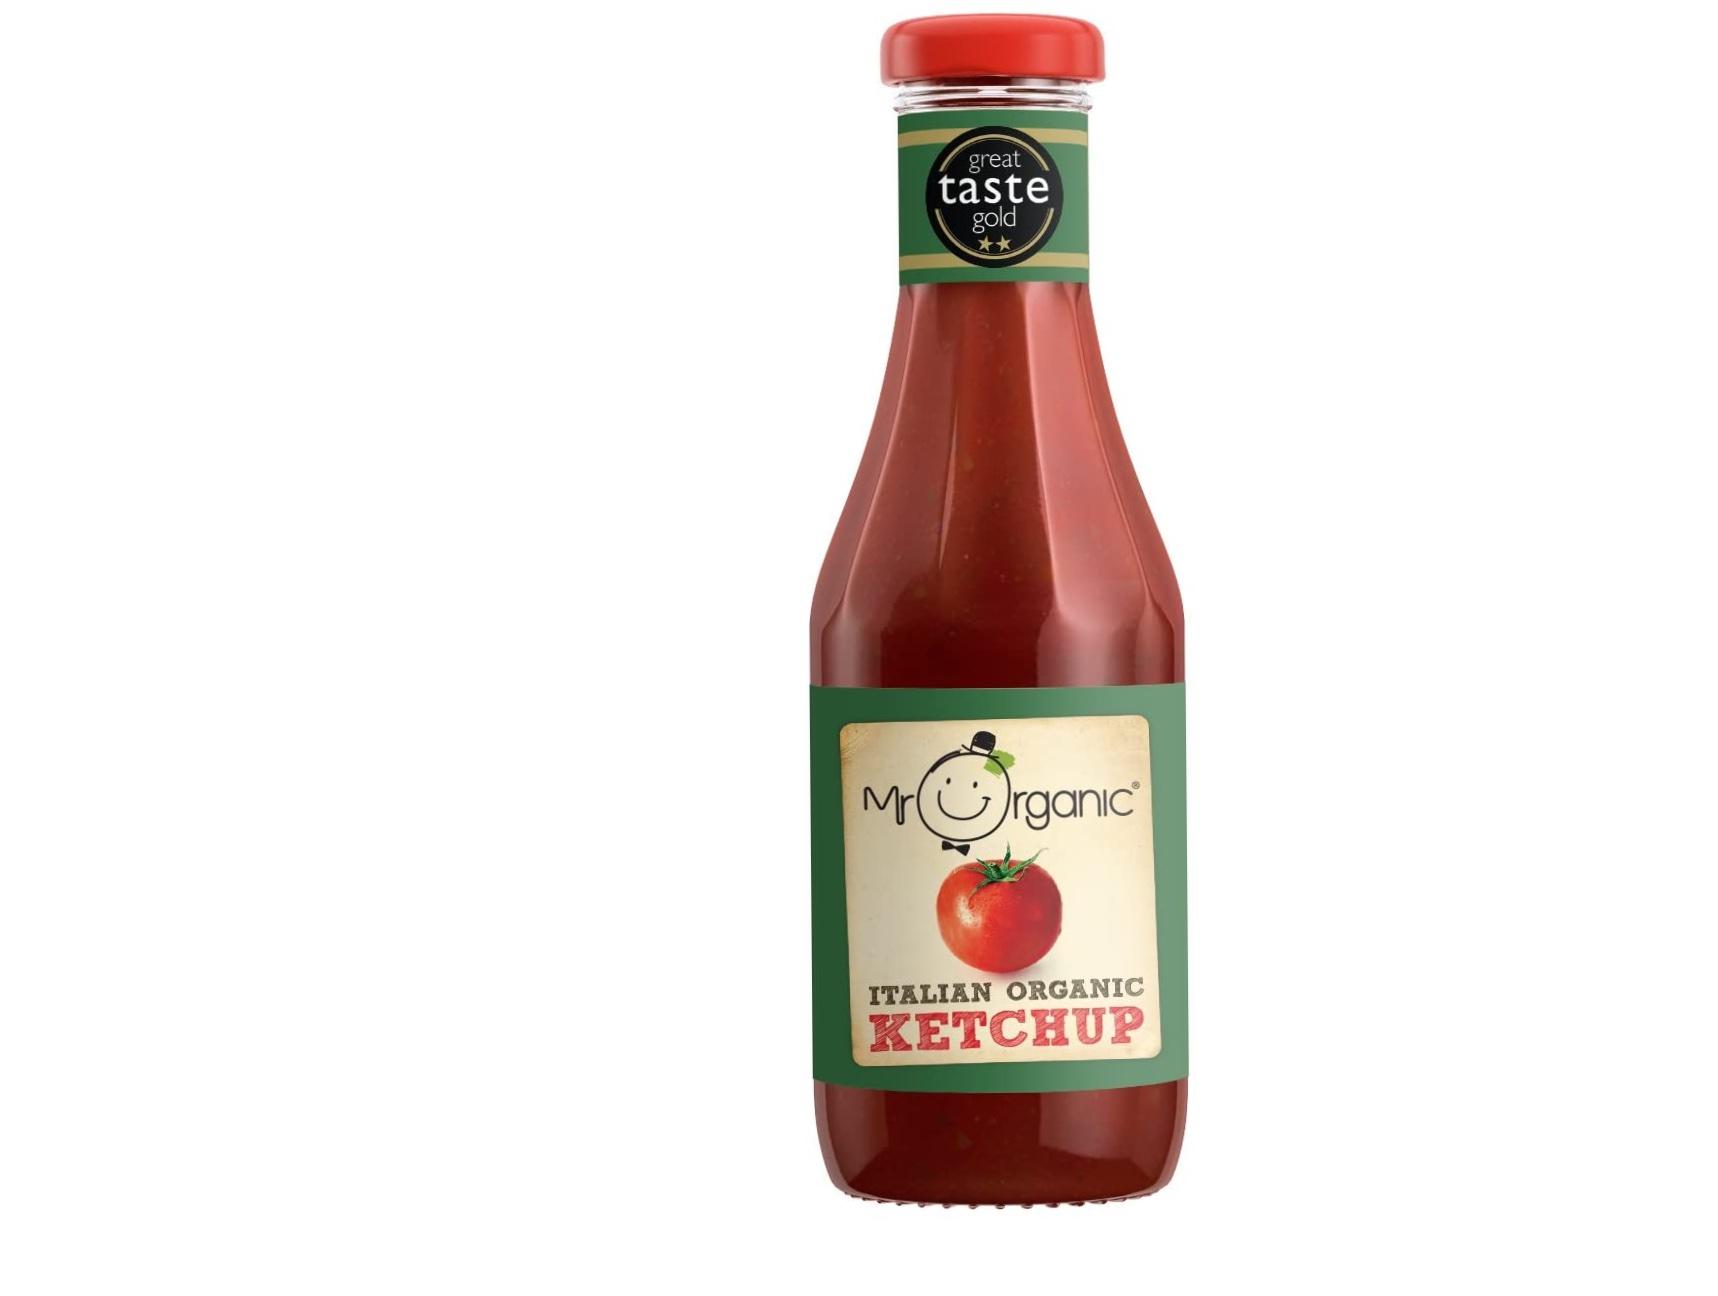 Tomato Ketchup (Mr Organic)